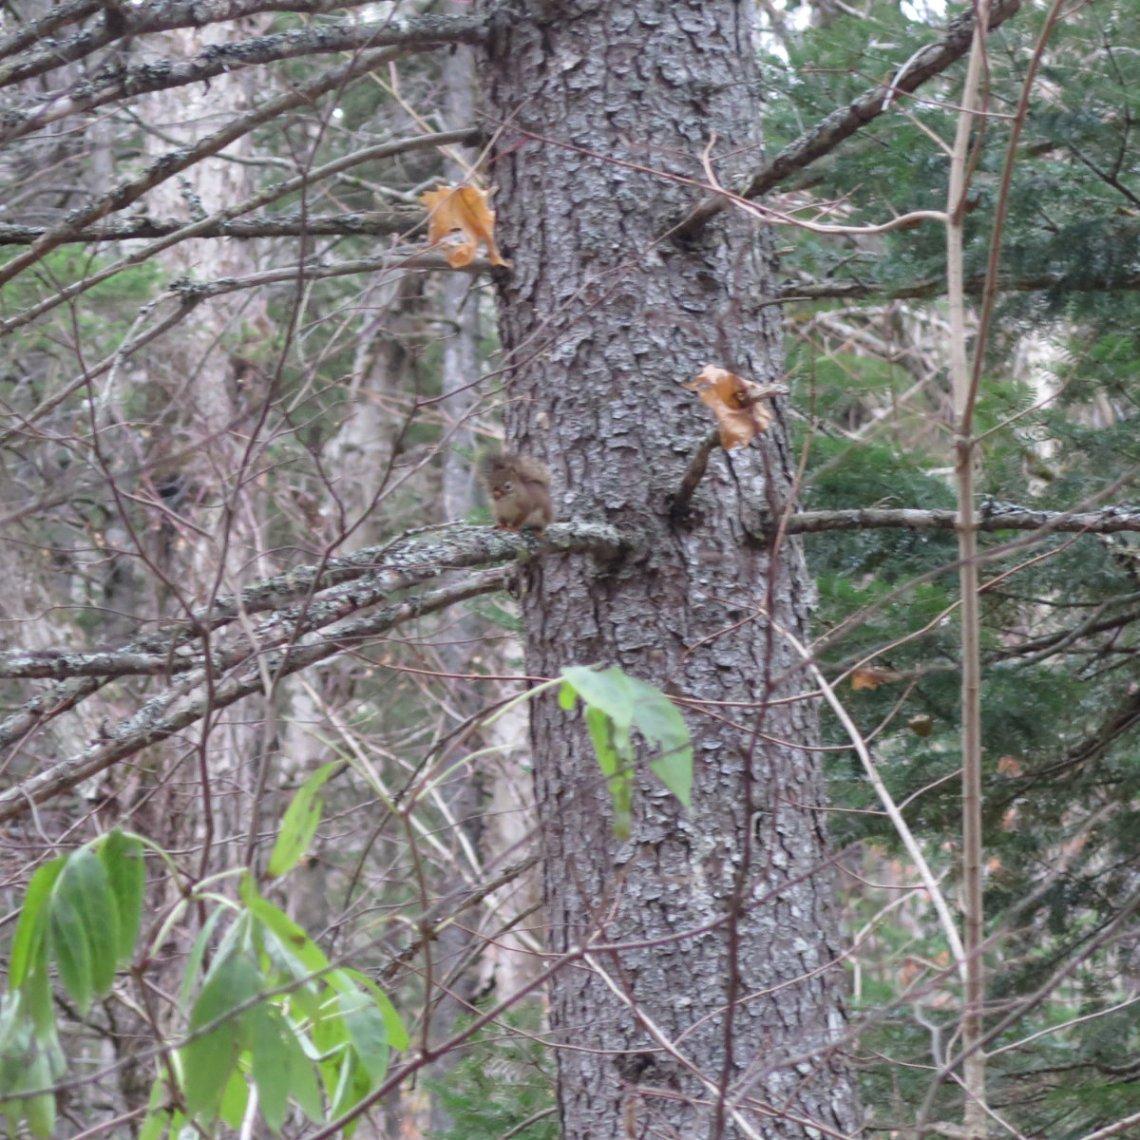 Red-Squirrel-Zealand-20191024